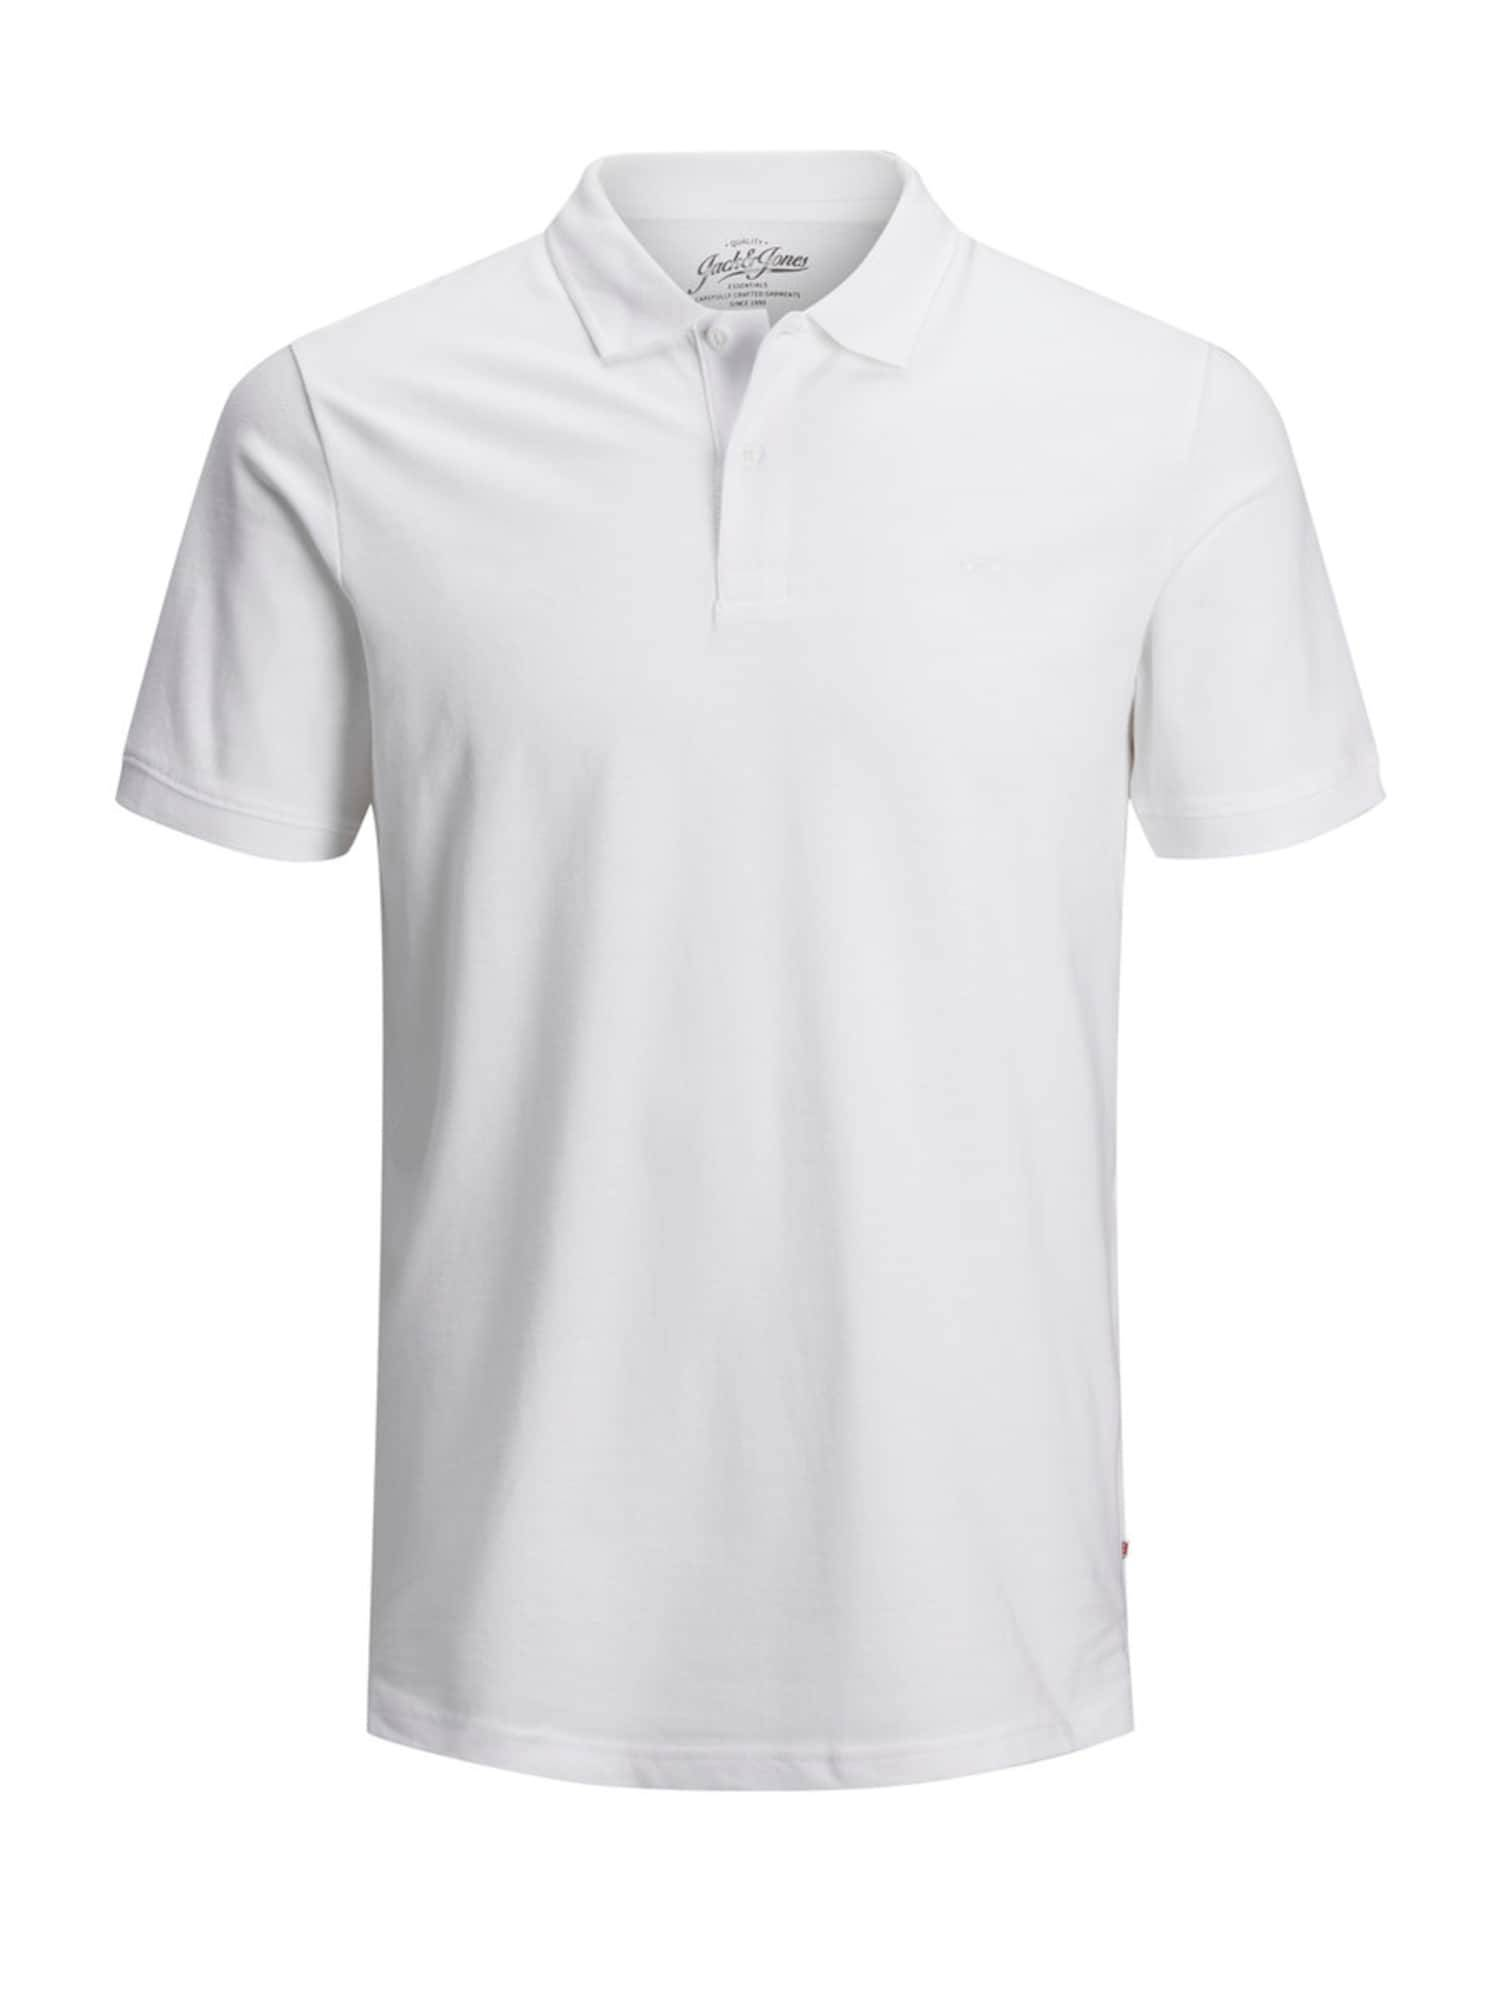 JACK & JONES T-Shirt  - Blanc - Taille: L - male